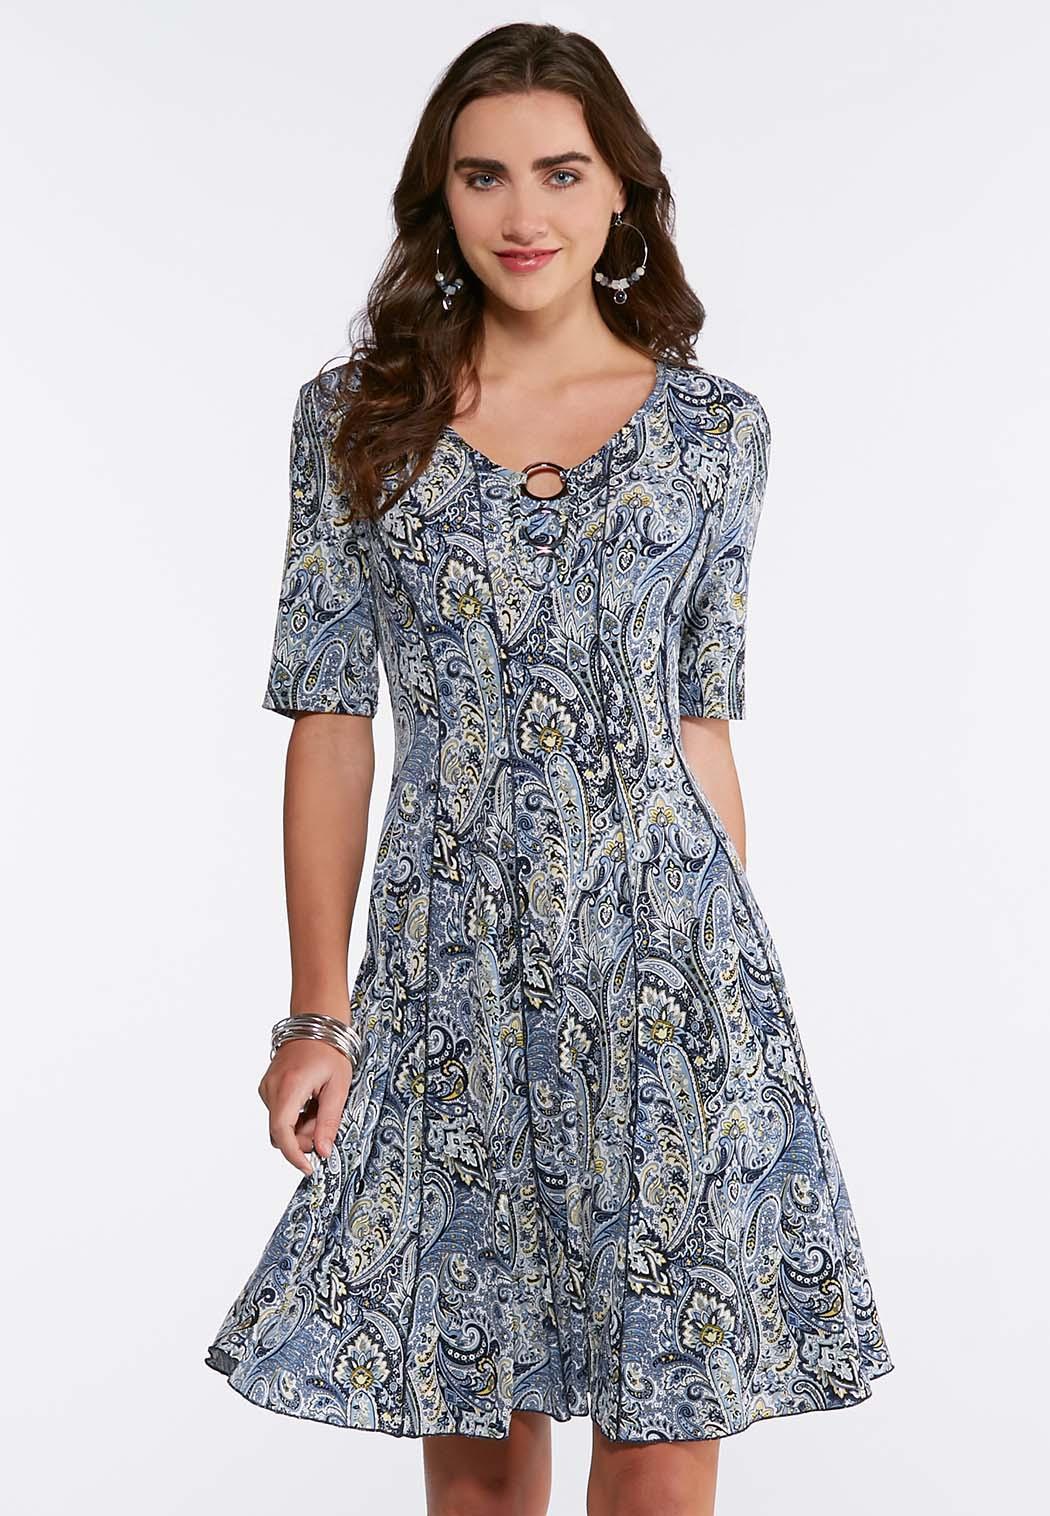 Embellished Seamed Paisley Dress